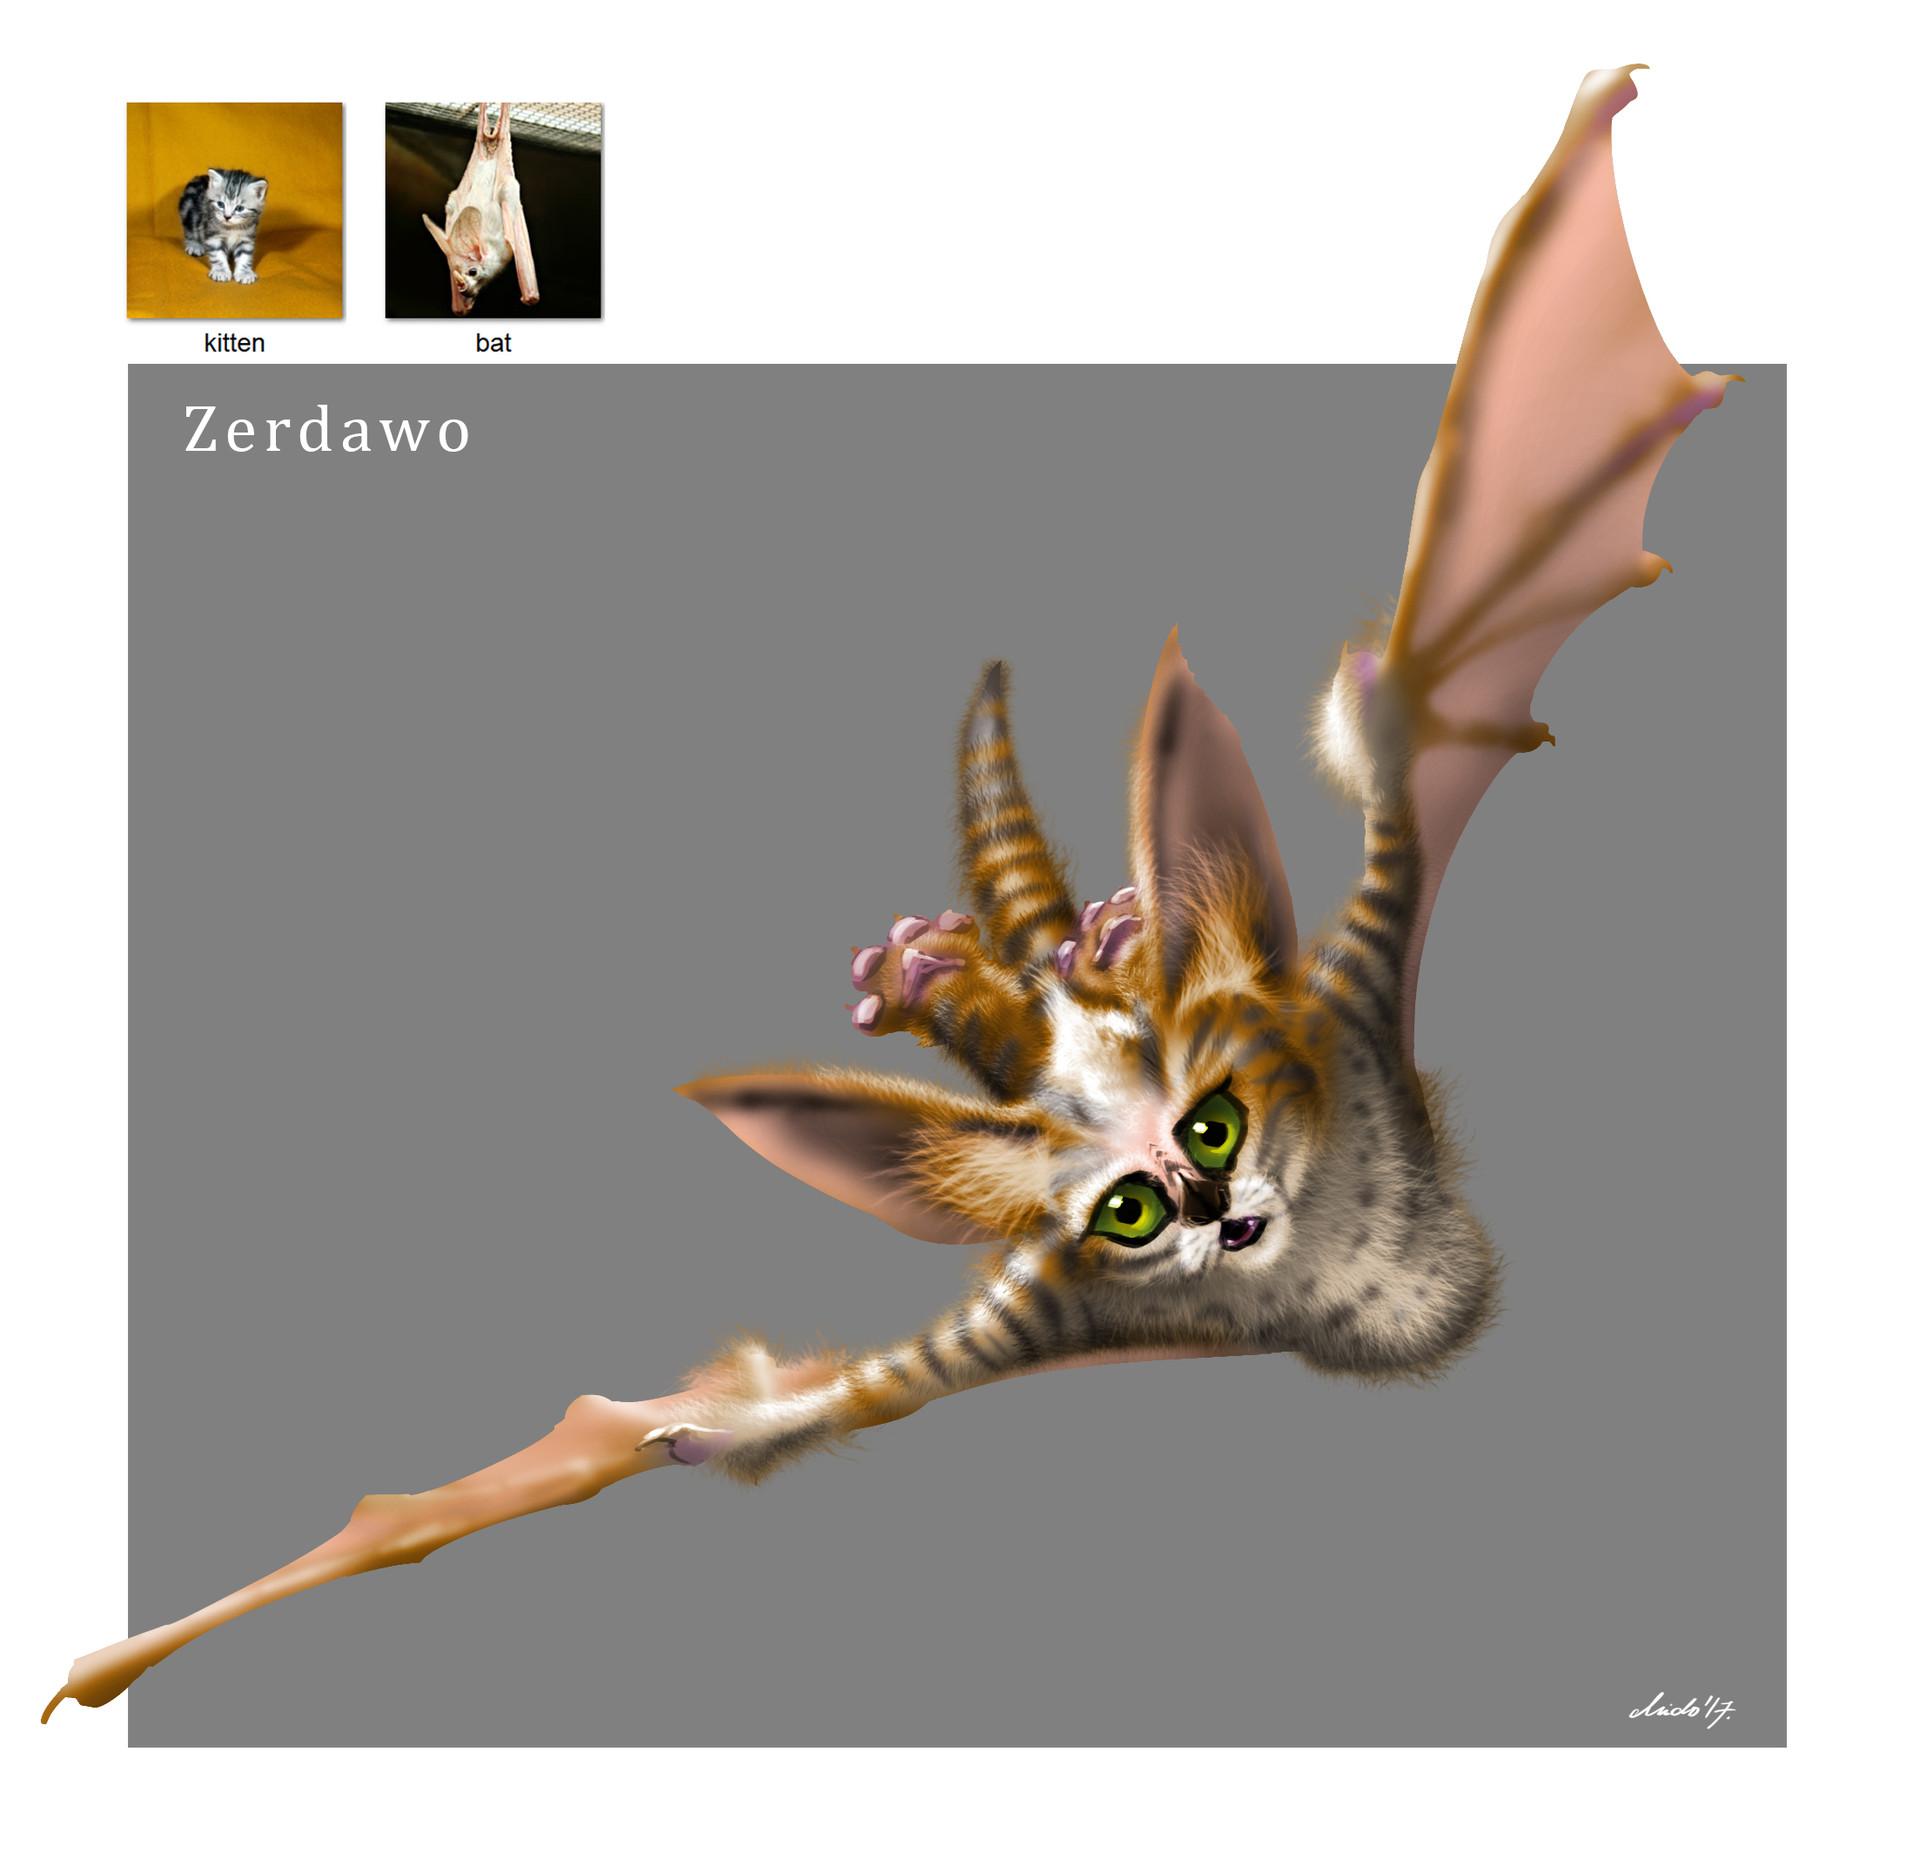 Midhat kapetanovic random creature mashup 035 zerdawo